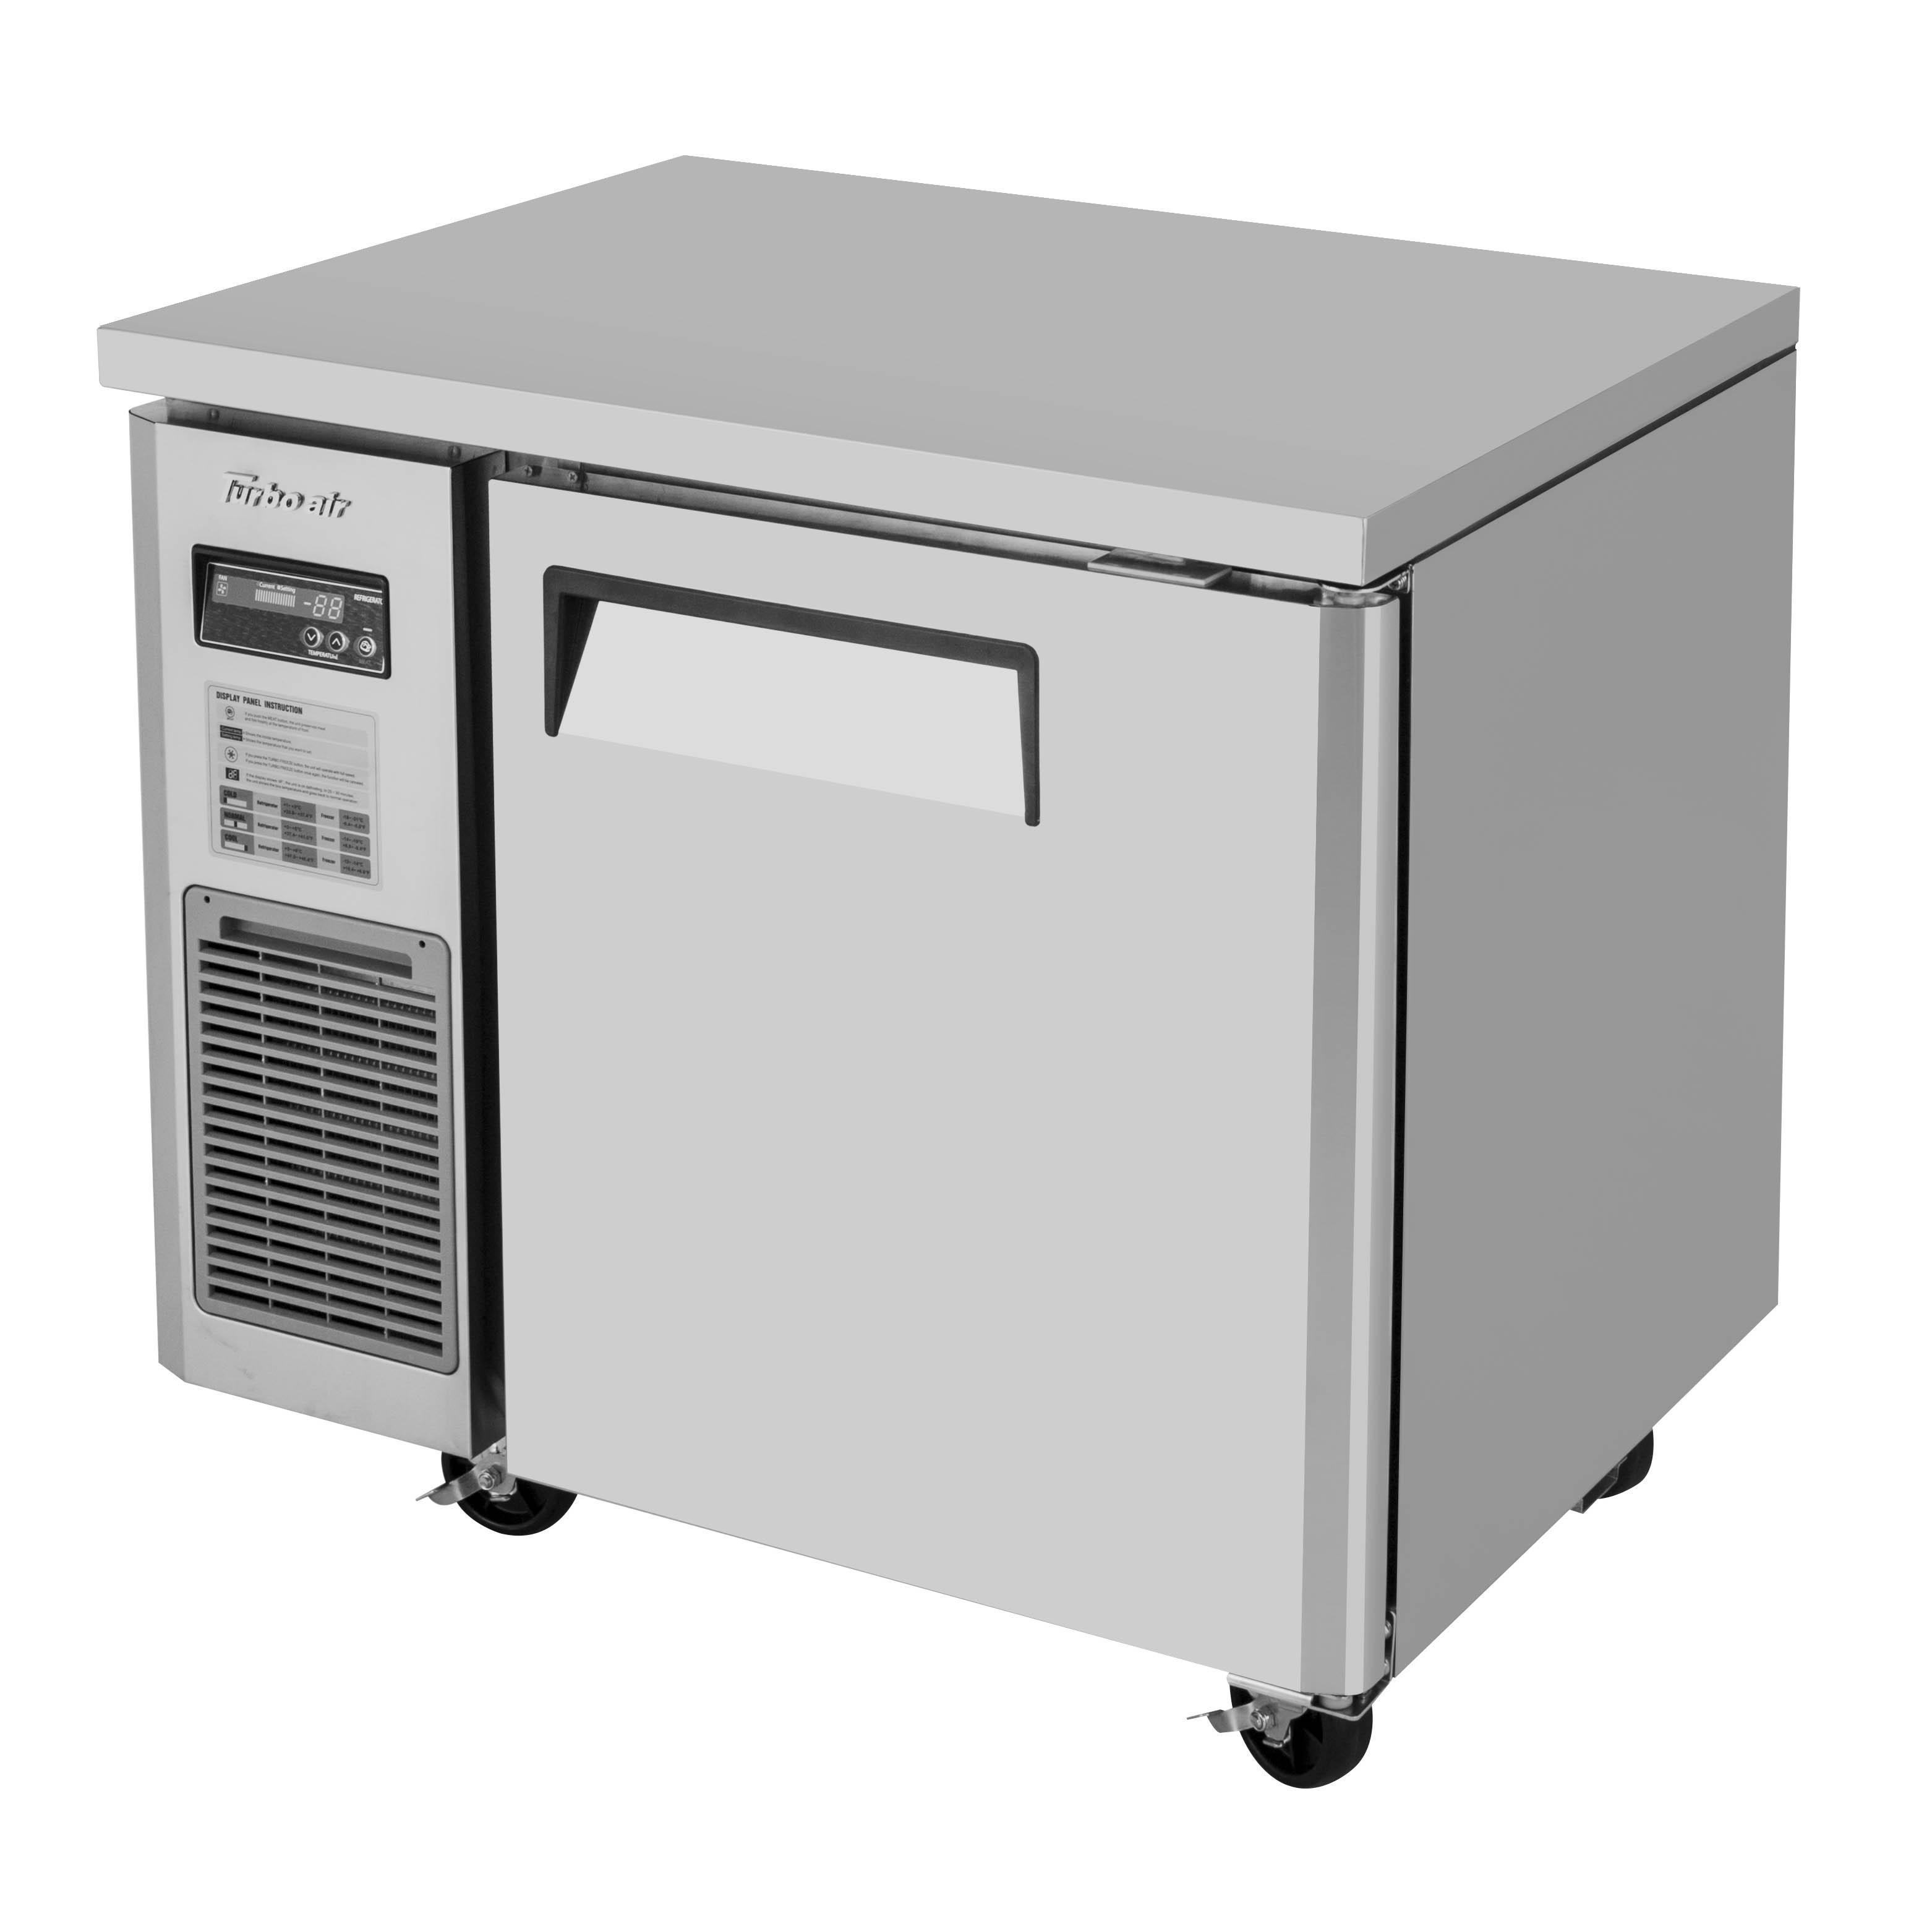 Turbo Air JUF-36-N freezer, undercounter, reach-in